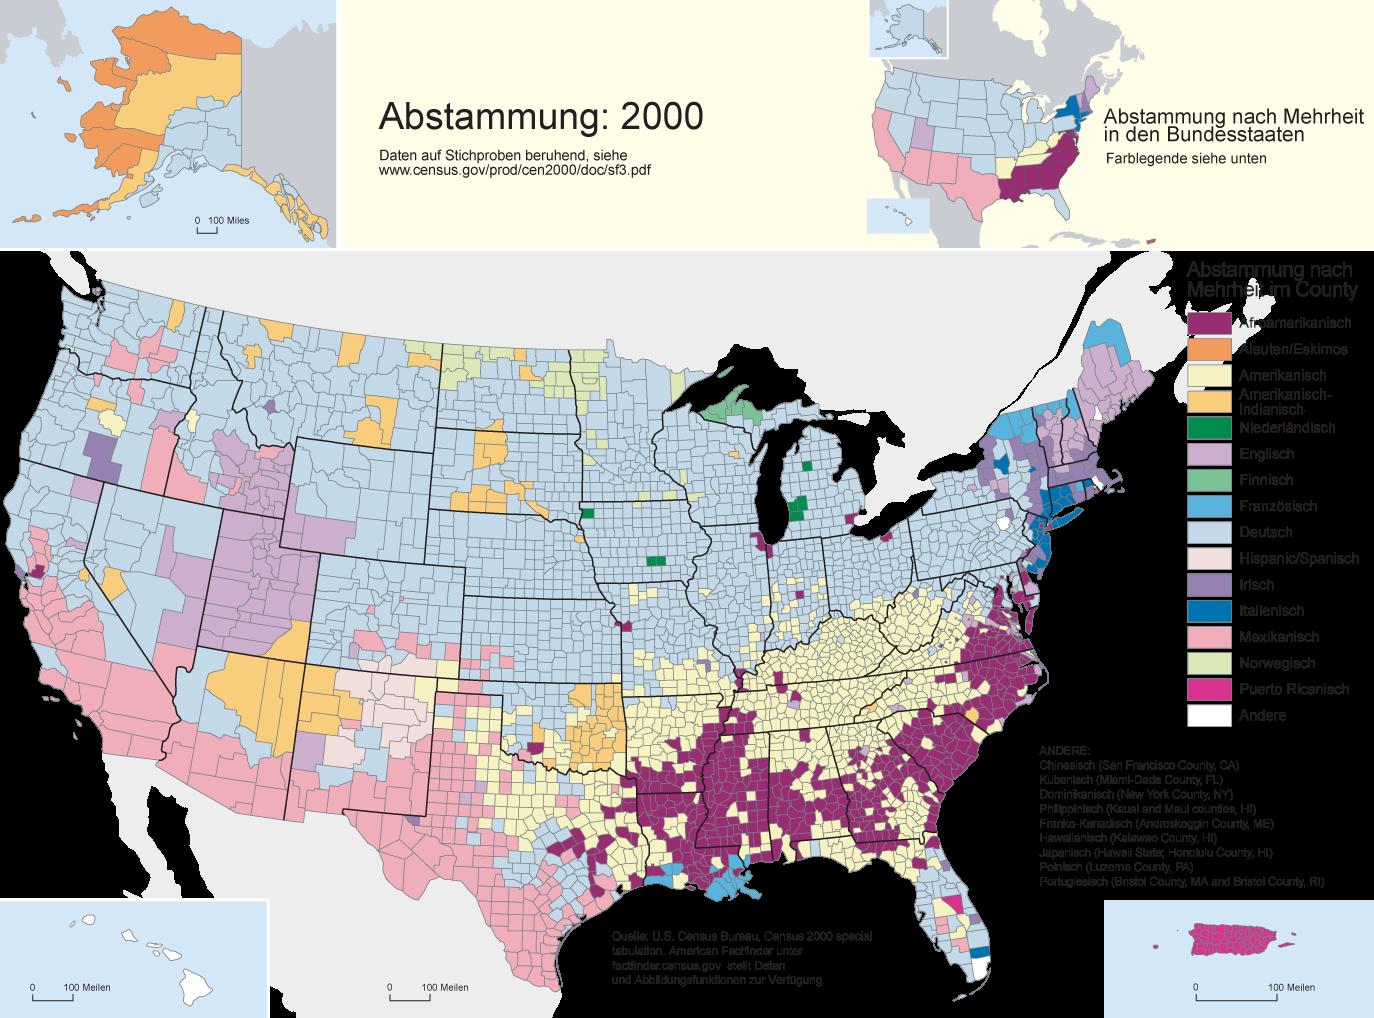 Abstammungsgruppen mit höchstem Bevölkerungsanteil in den Counties